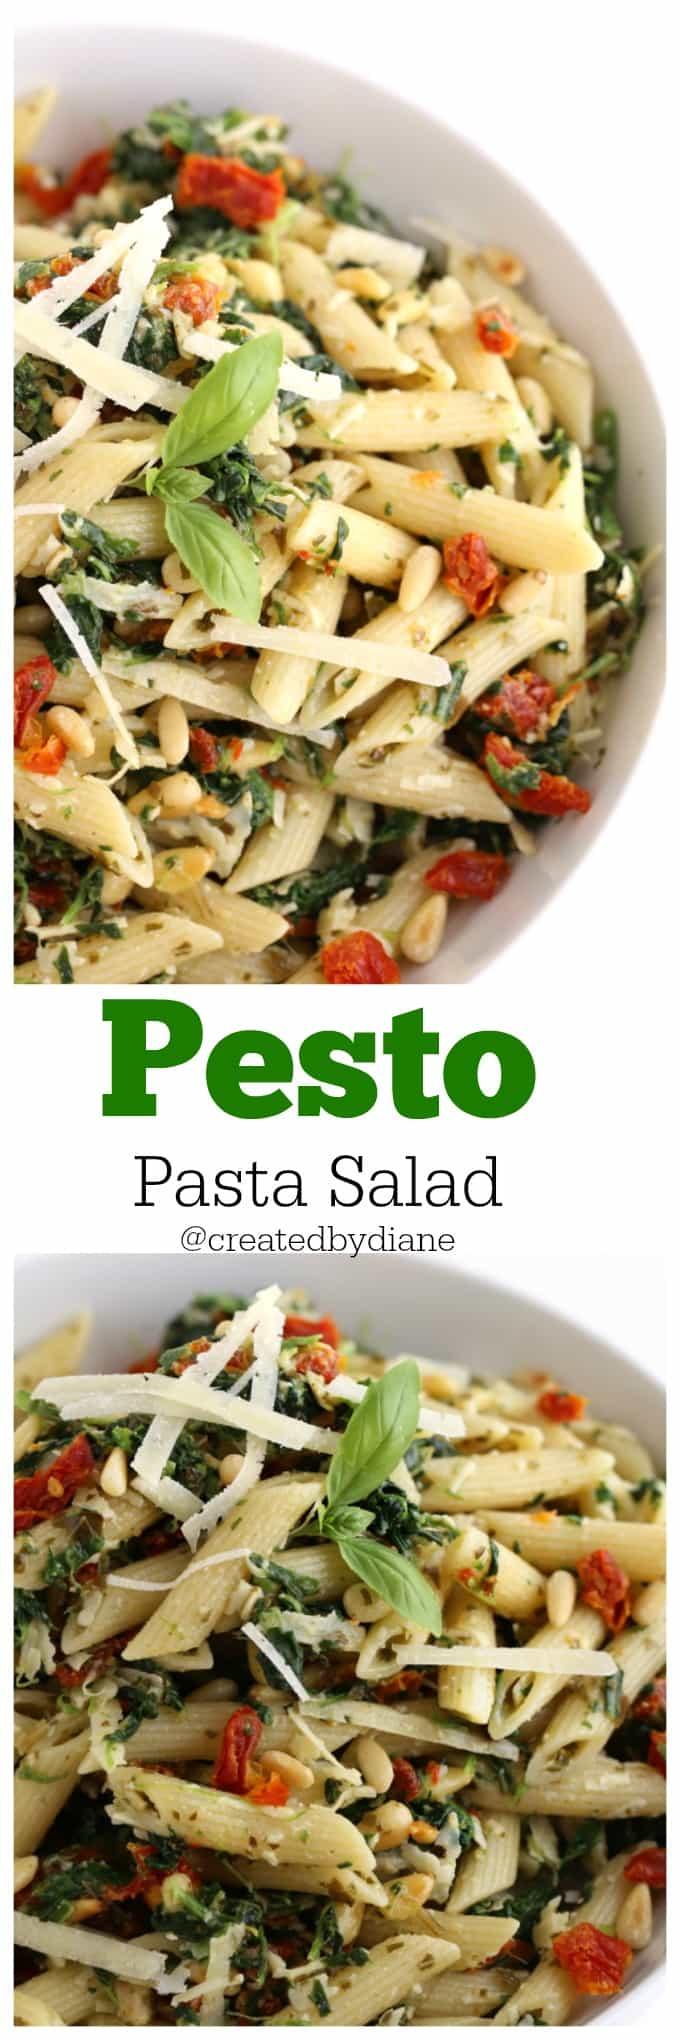 pesto pasta salad @createdbydiane